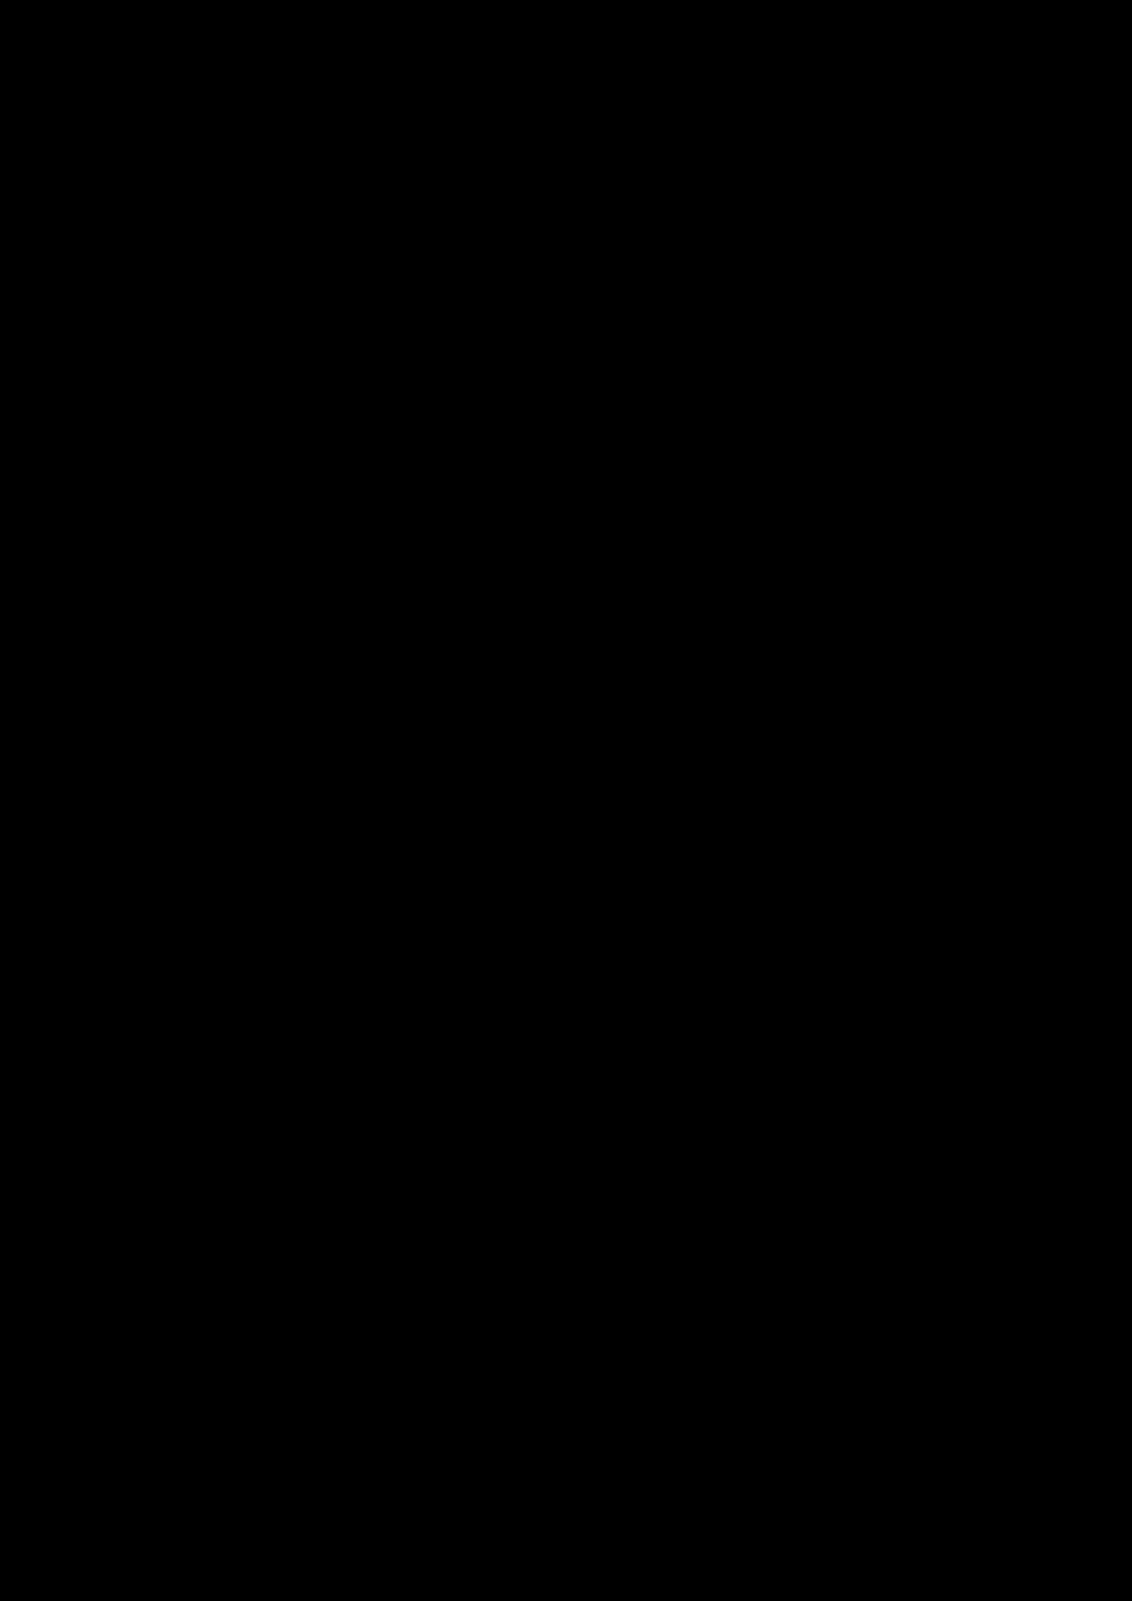 Deklassirovannyim elementam slide, Image 8